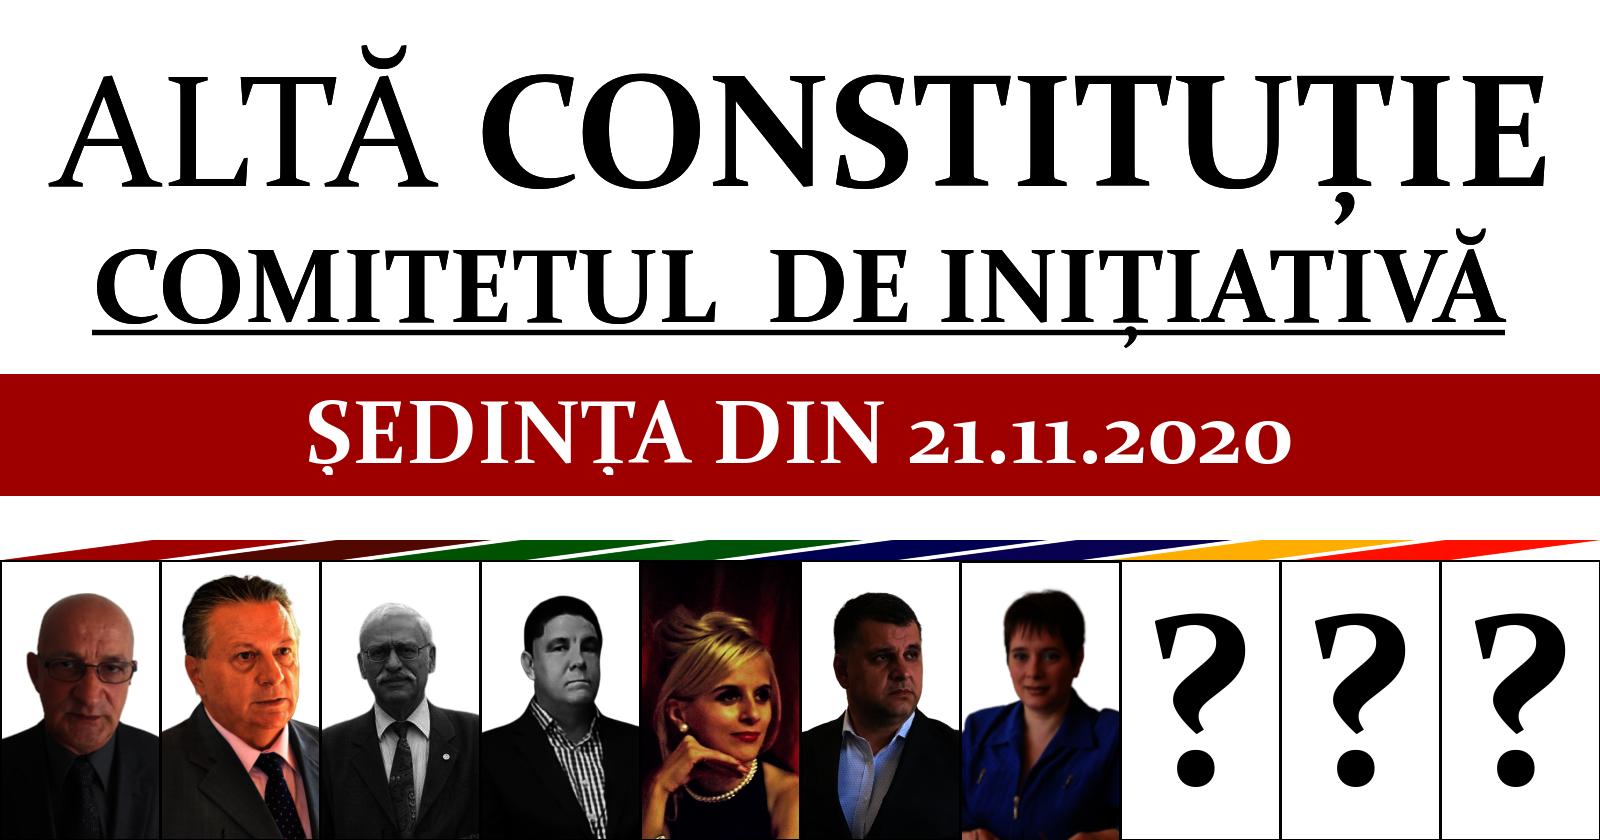 https://ziarul.romania-rationala.ro/control/articole/articole/2020-11-21-comitet-initiativa-alta-constitutie.png